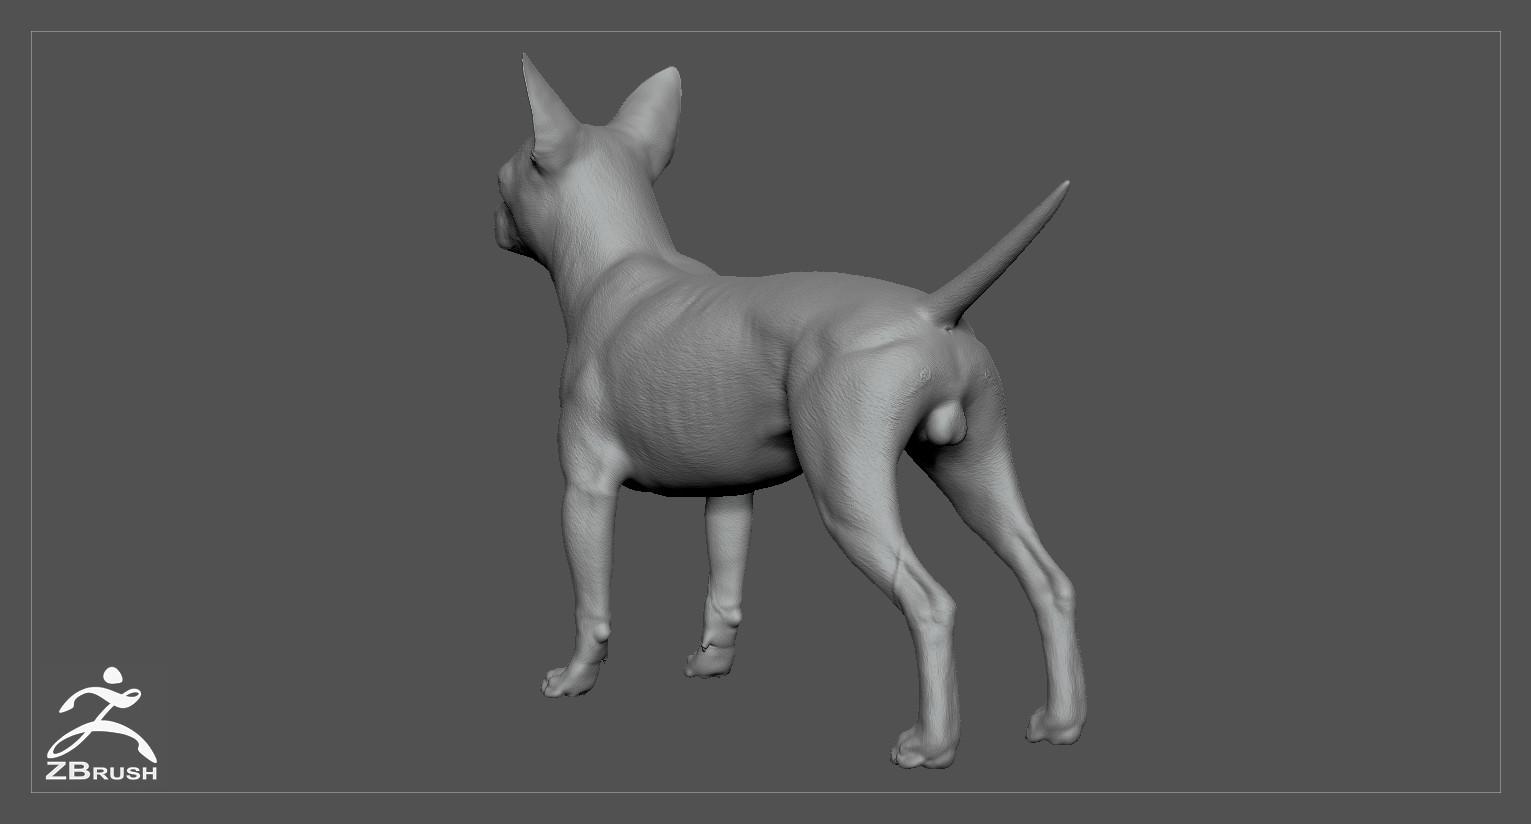 Chihuahua by alexlashko zbrush 05